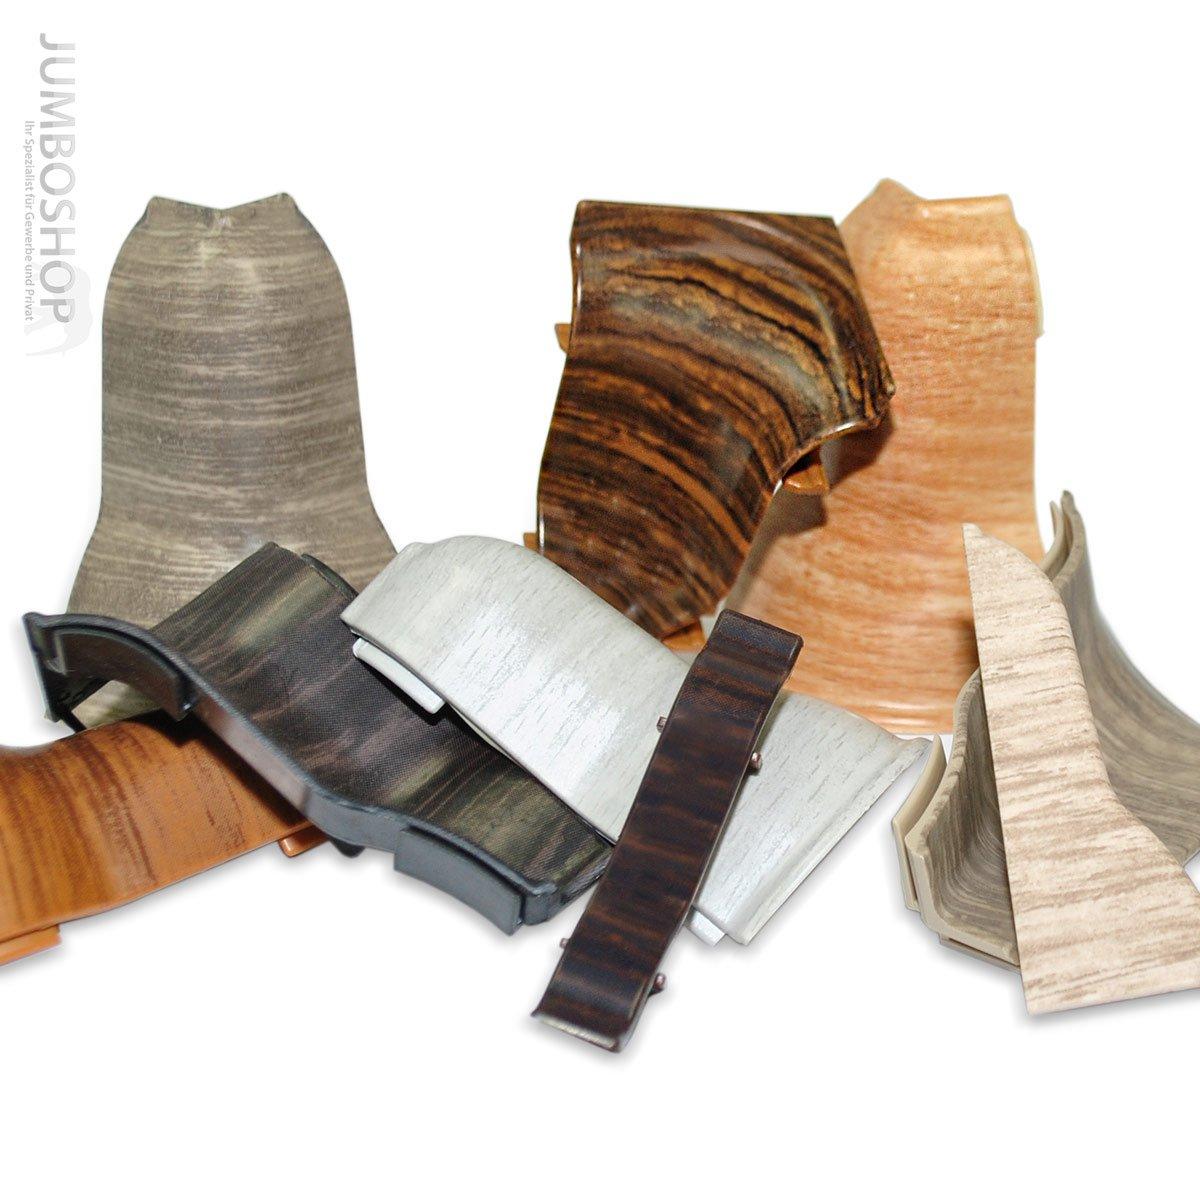 sockelleisten kunststoff sockelleisten wand boden. Black Bedroom Furniture Sets. Home Design Ideas